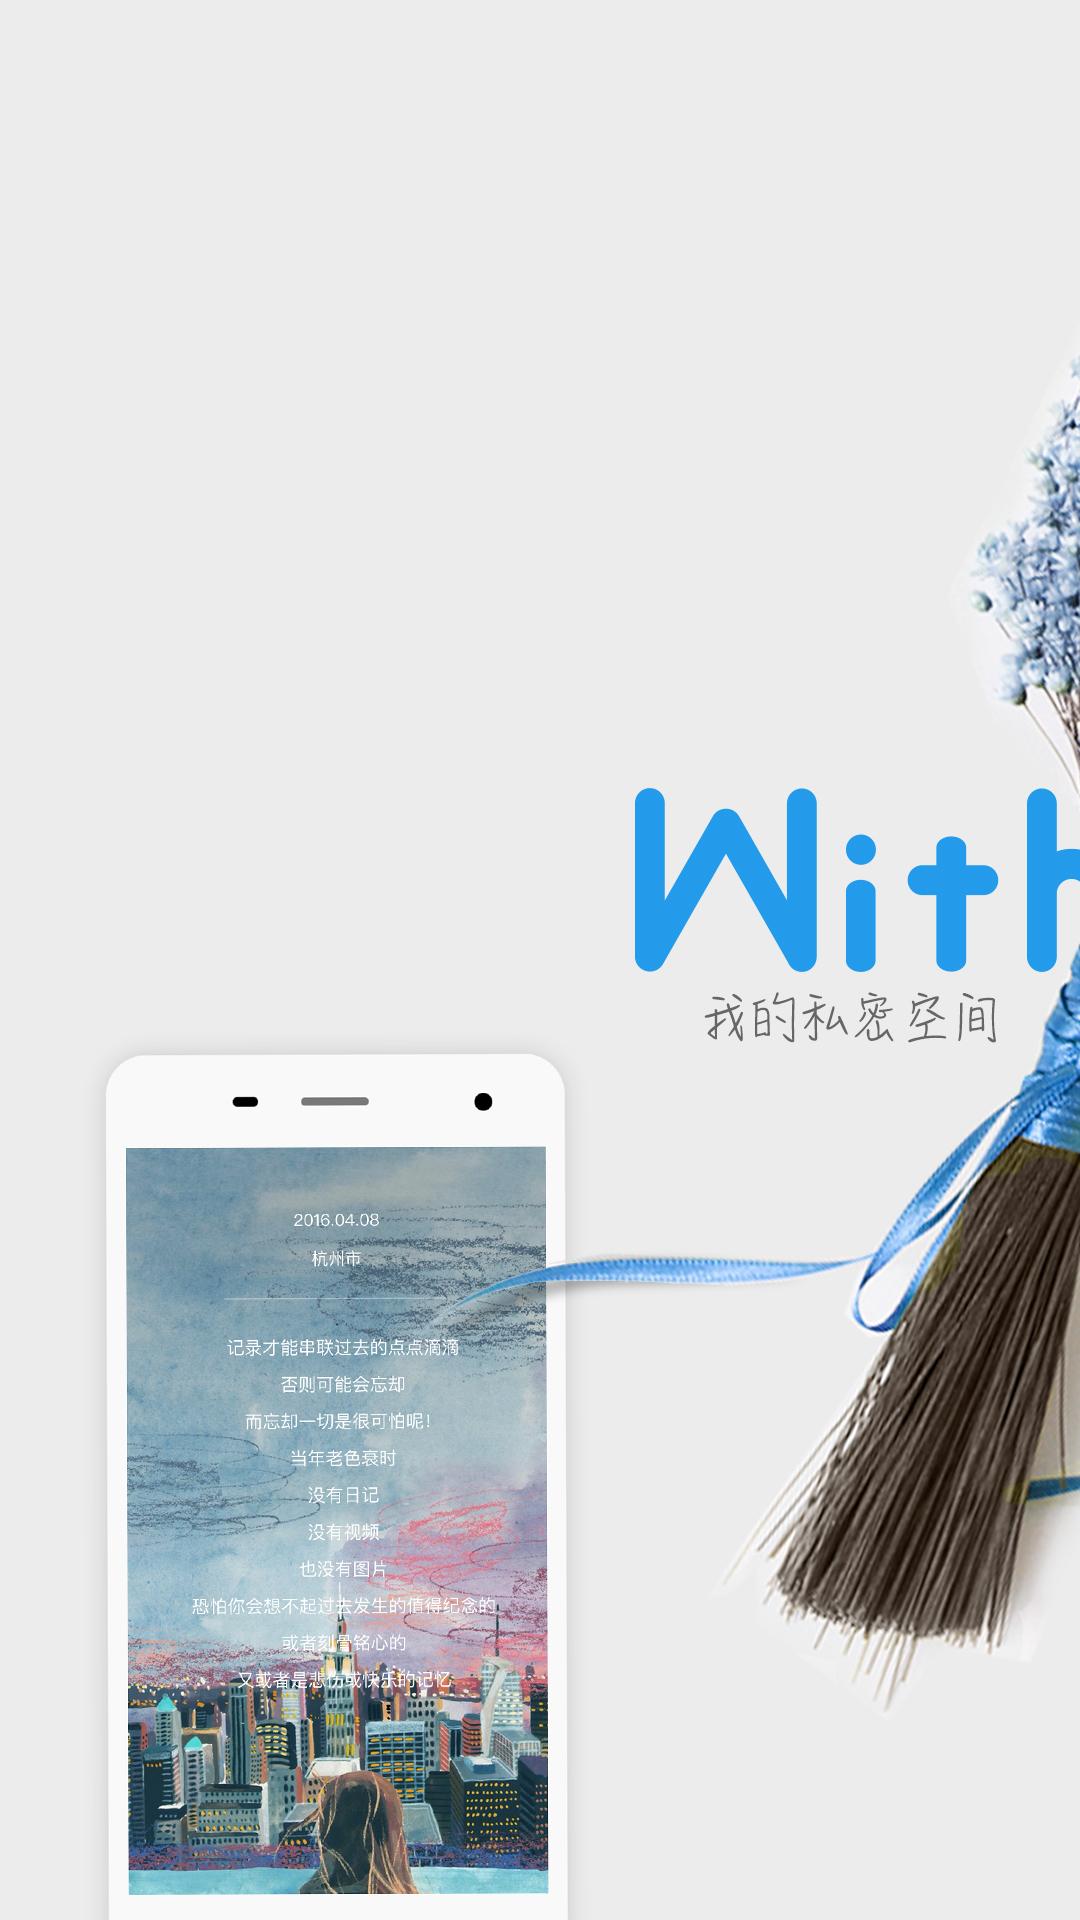 WithMe日记本软件截图0